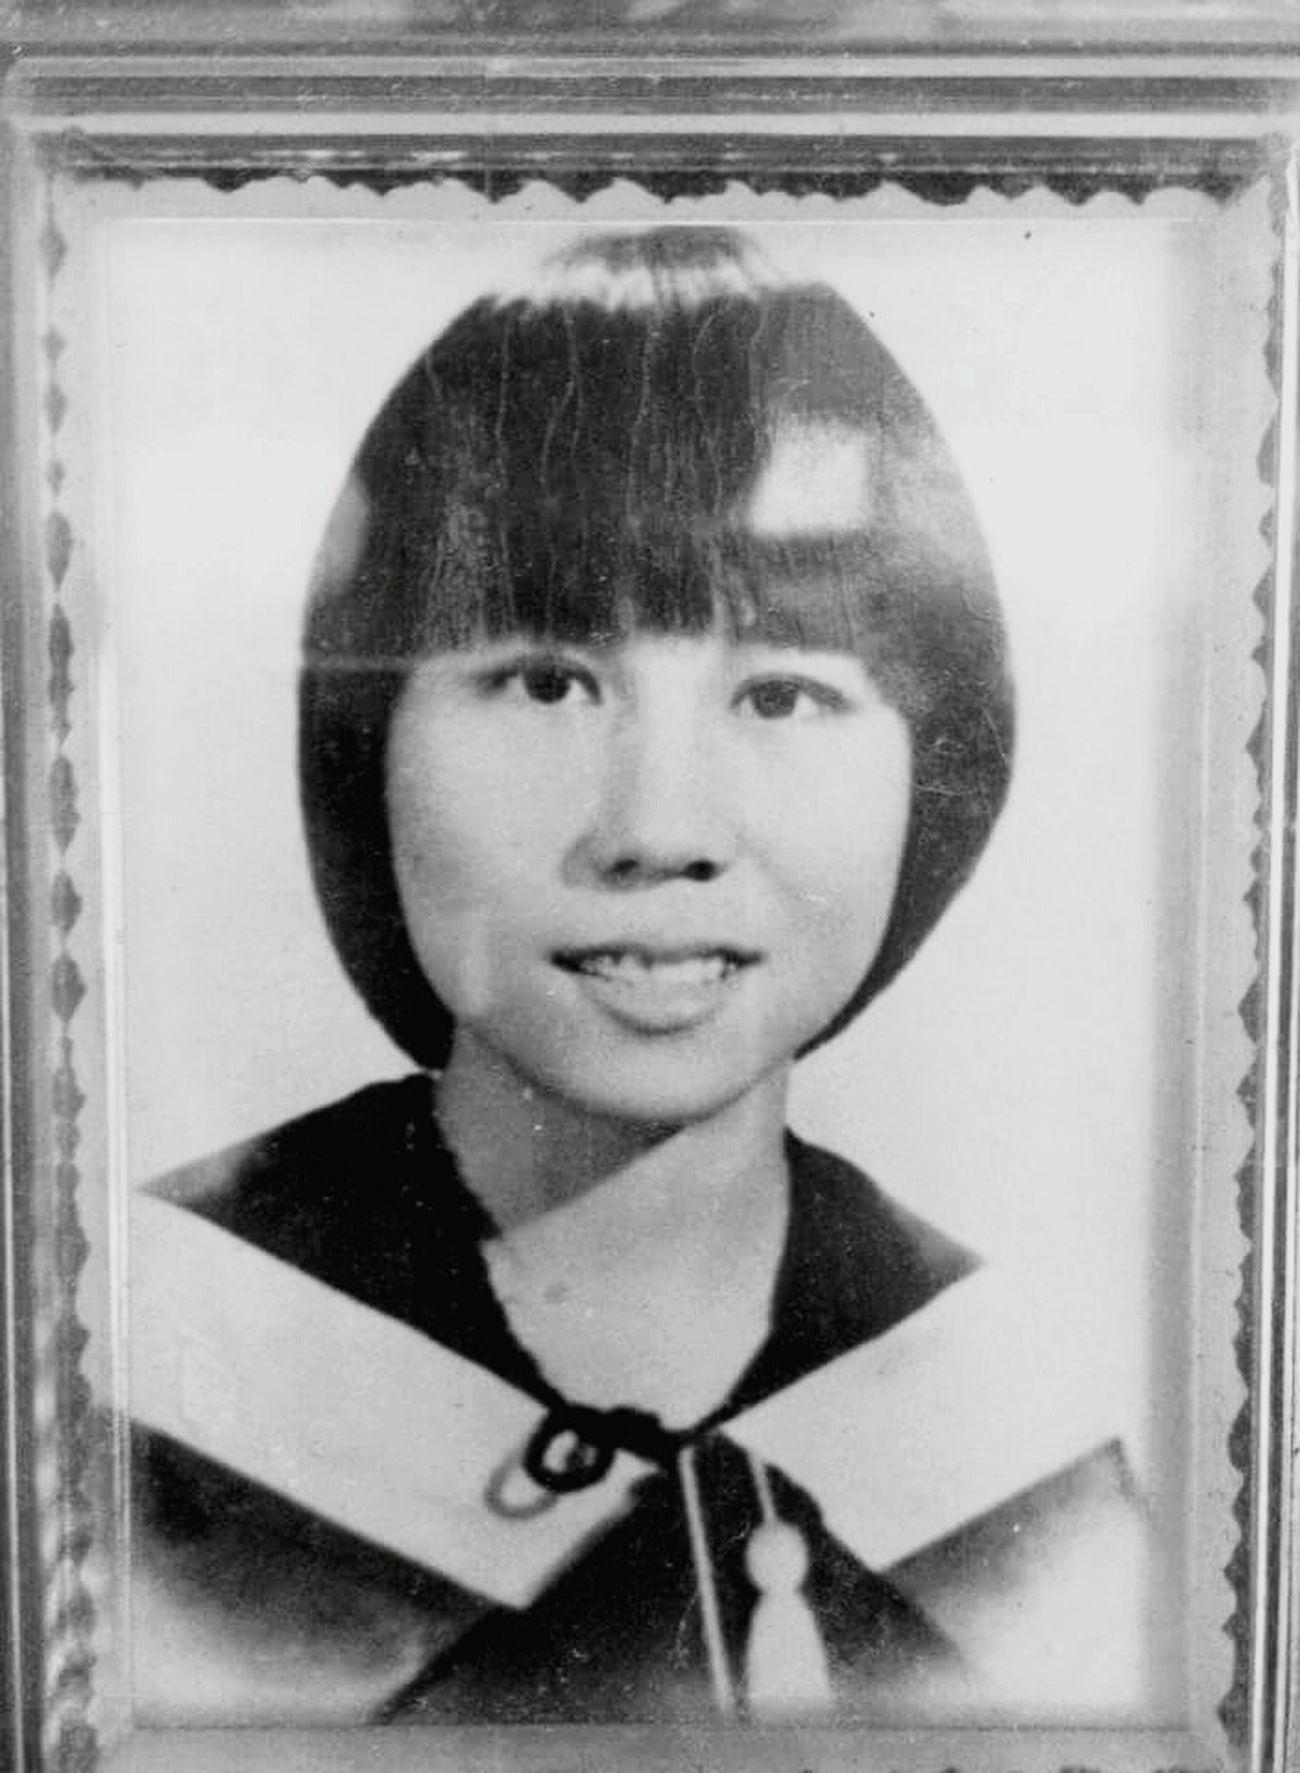 My mom Authentic B&W Portrait Vintage Photo